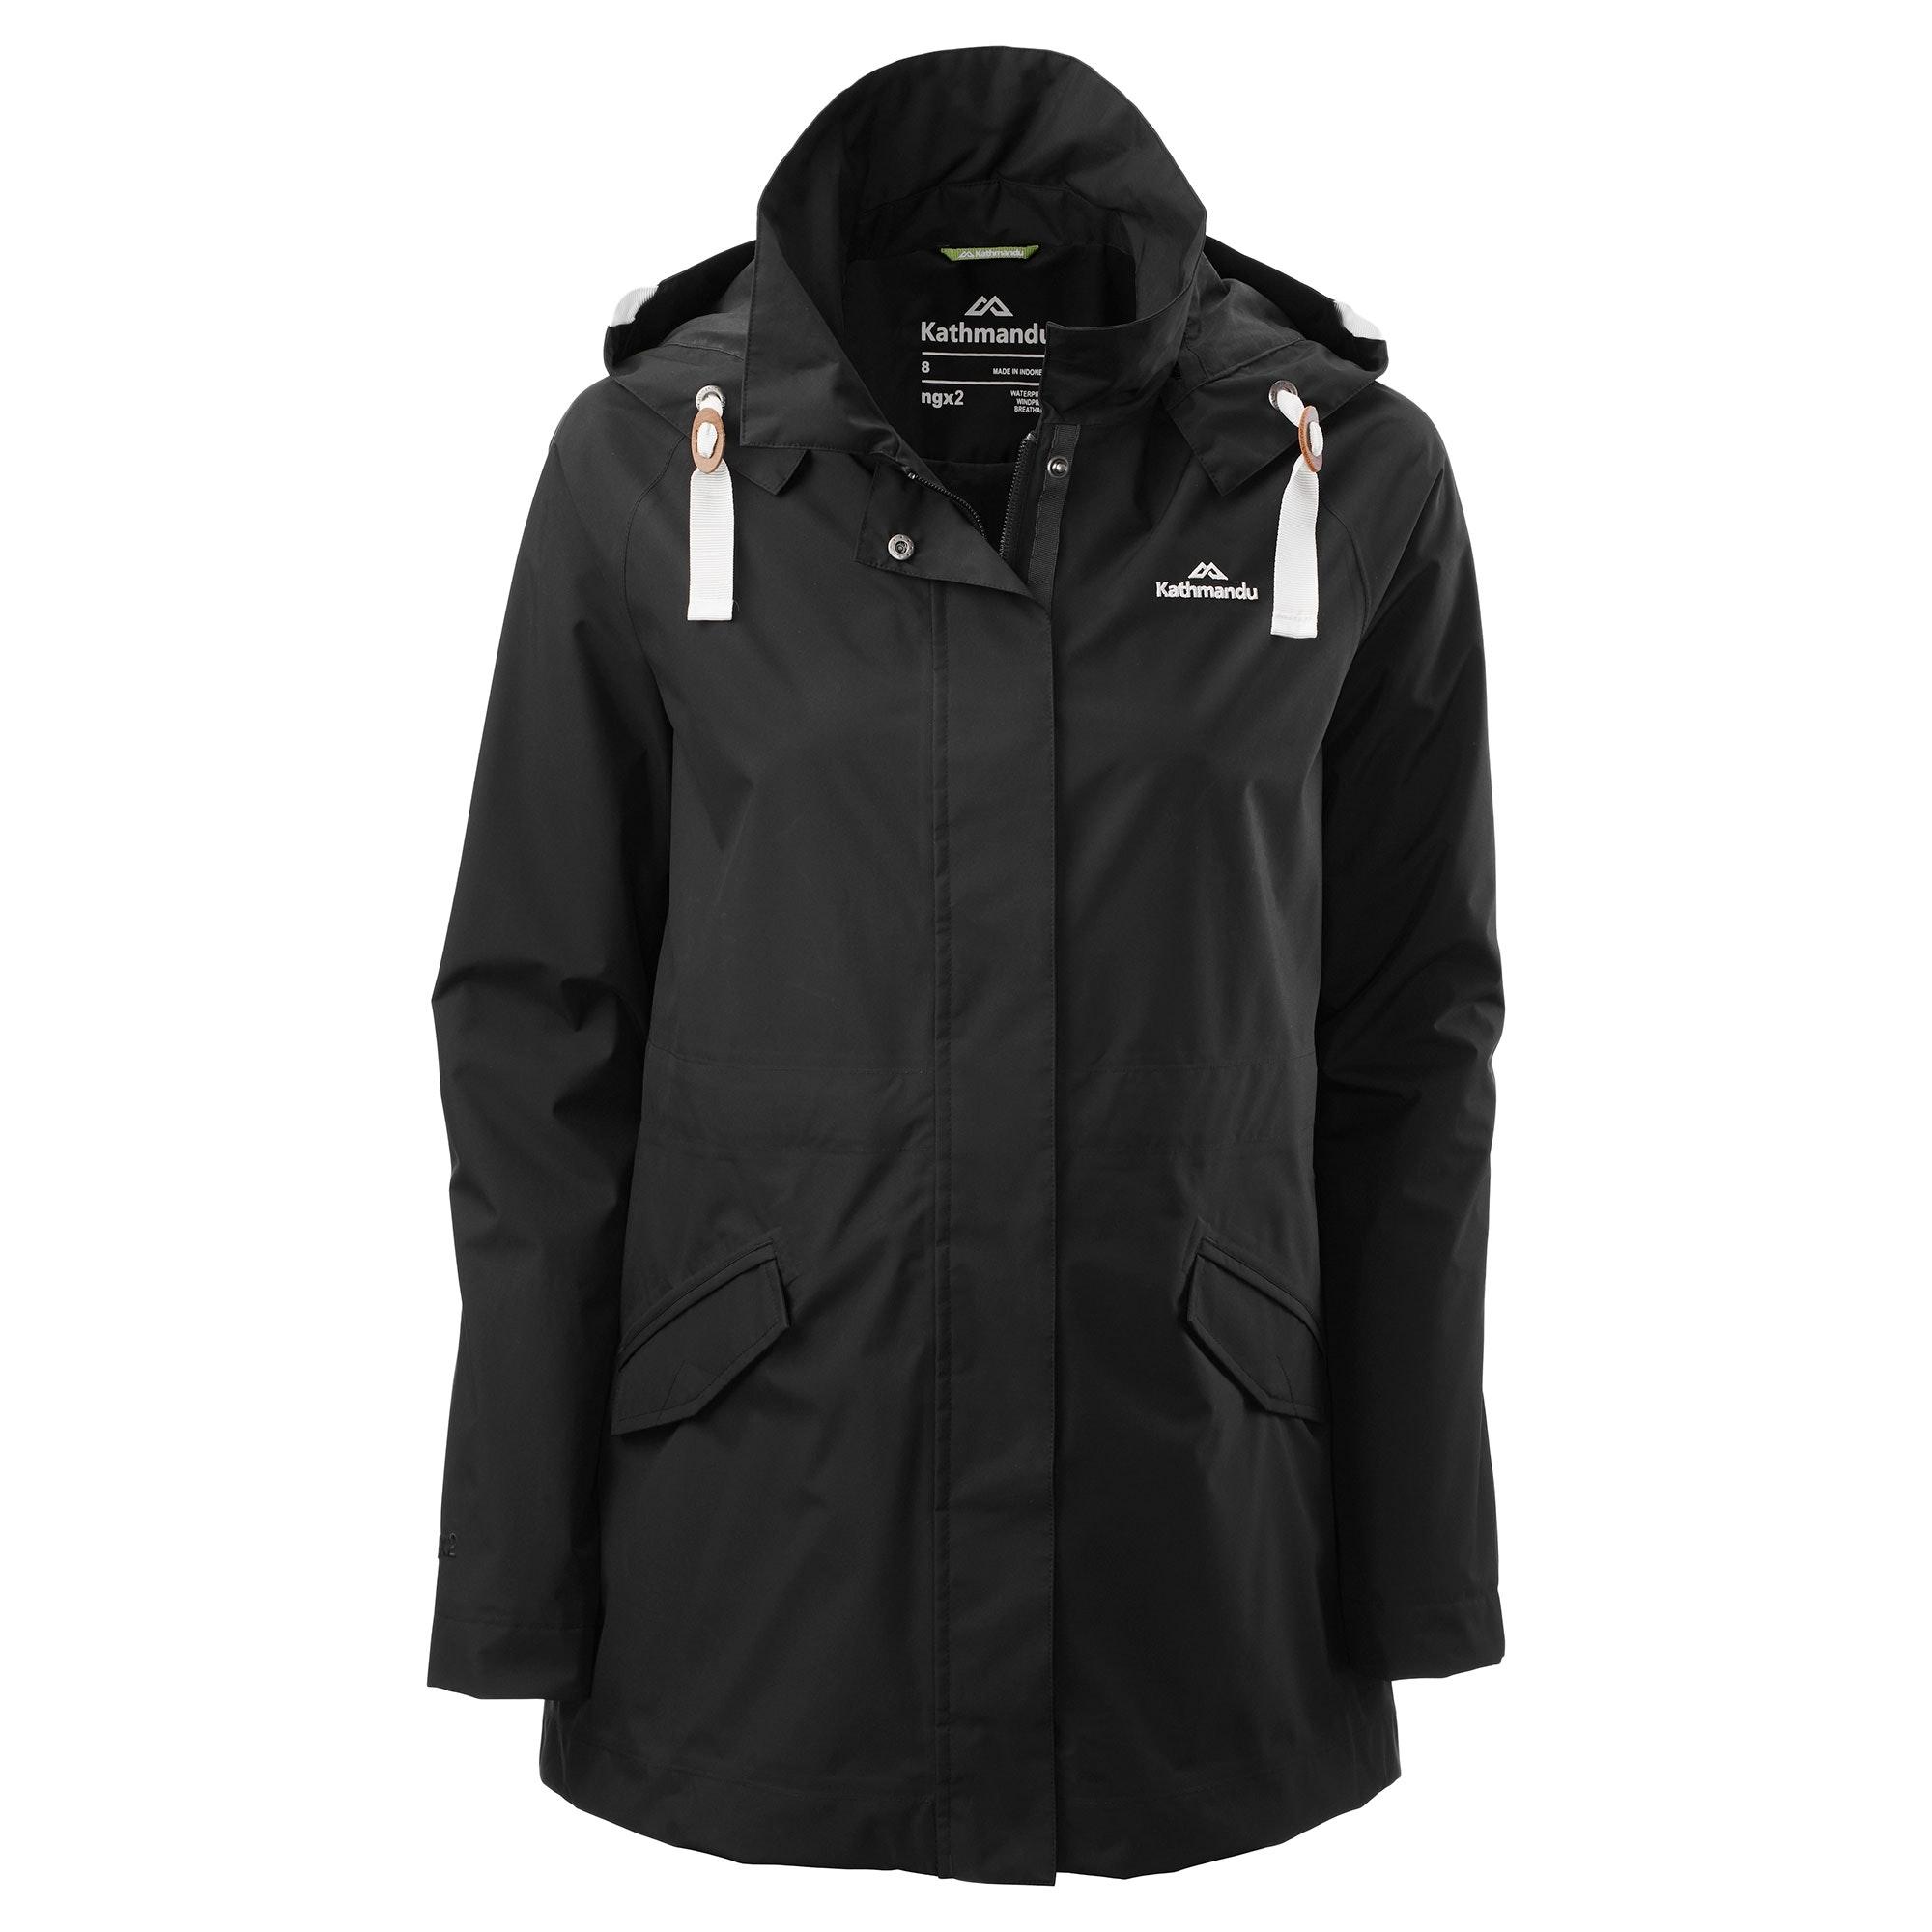 Kathmandu-Federate-Women-039-s-Windproof-Waterproof-Outdoor-Rain-Jacket-Coat